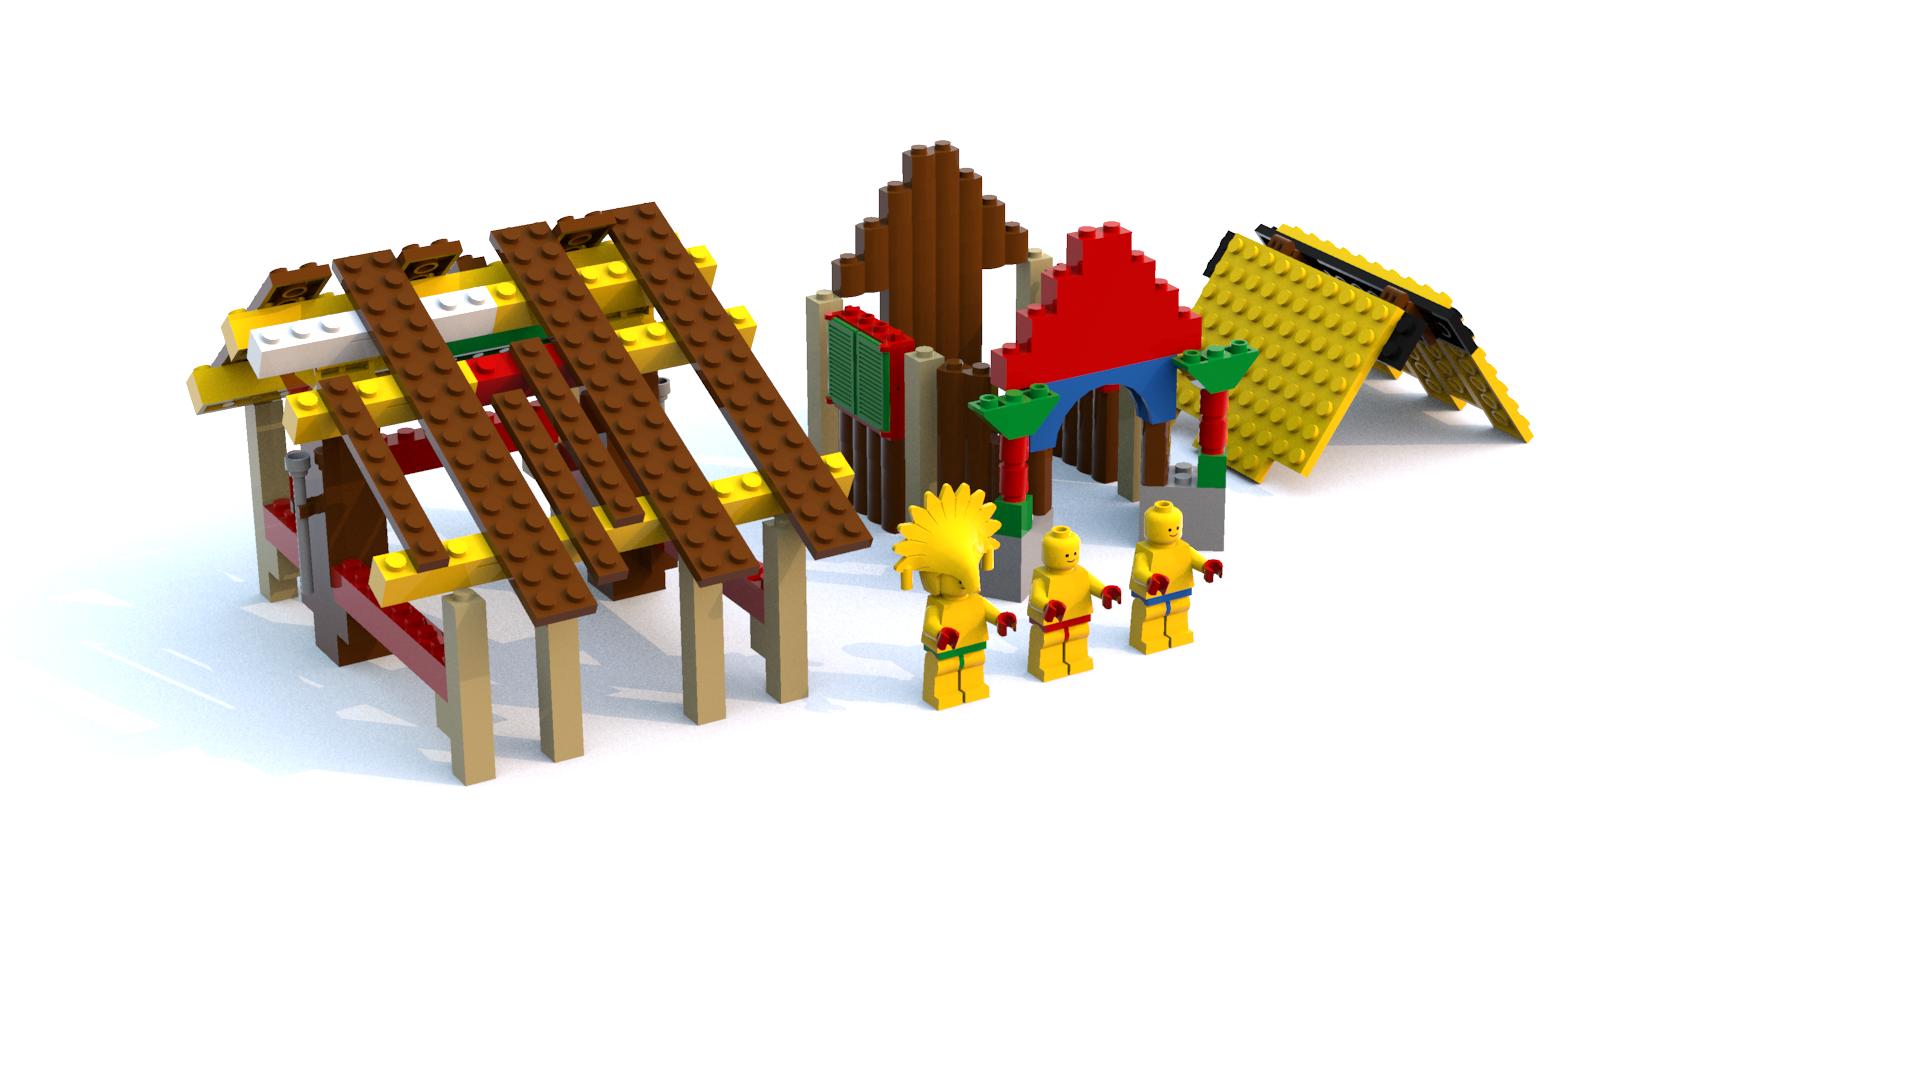 Lego Racers 2 Dino Island Islanders' Village LDD Model